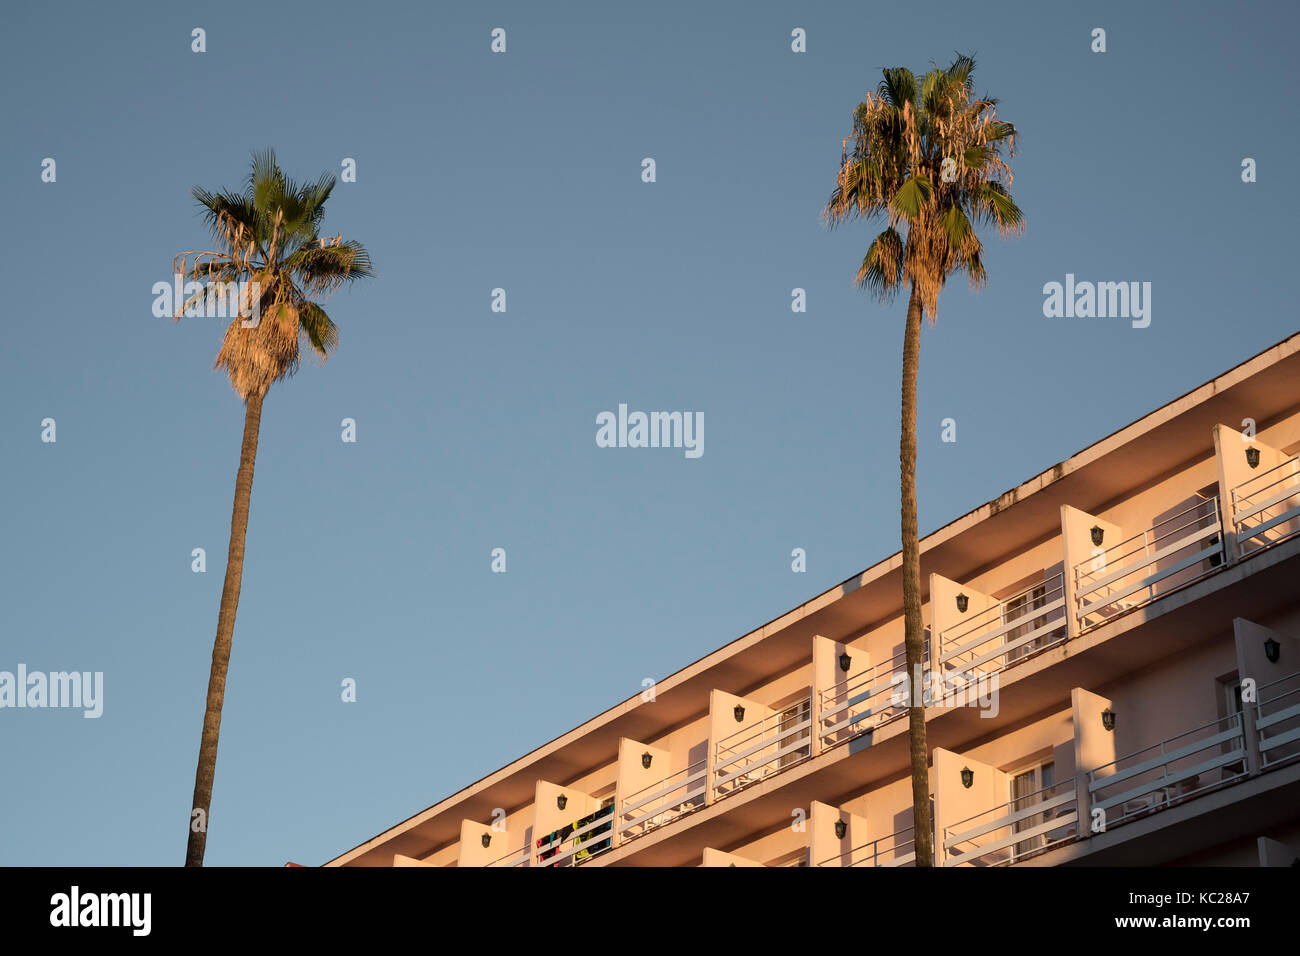 Palm tress against a clear blue sky outside the Guitart Rosa hotel, Lloret de Mar Stock Photo